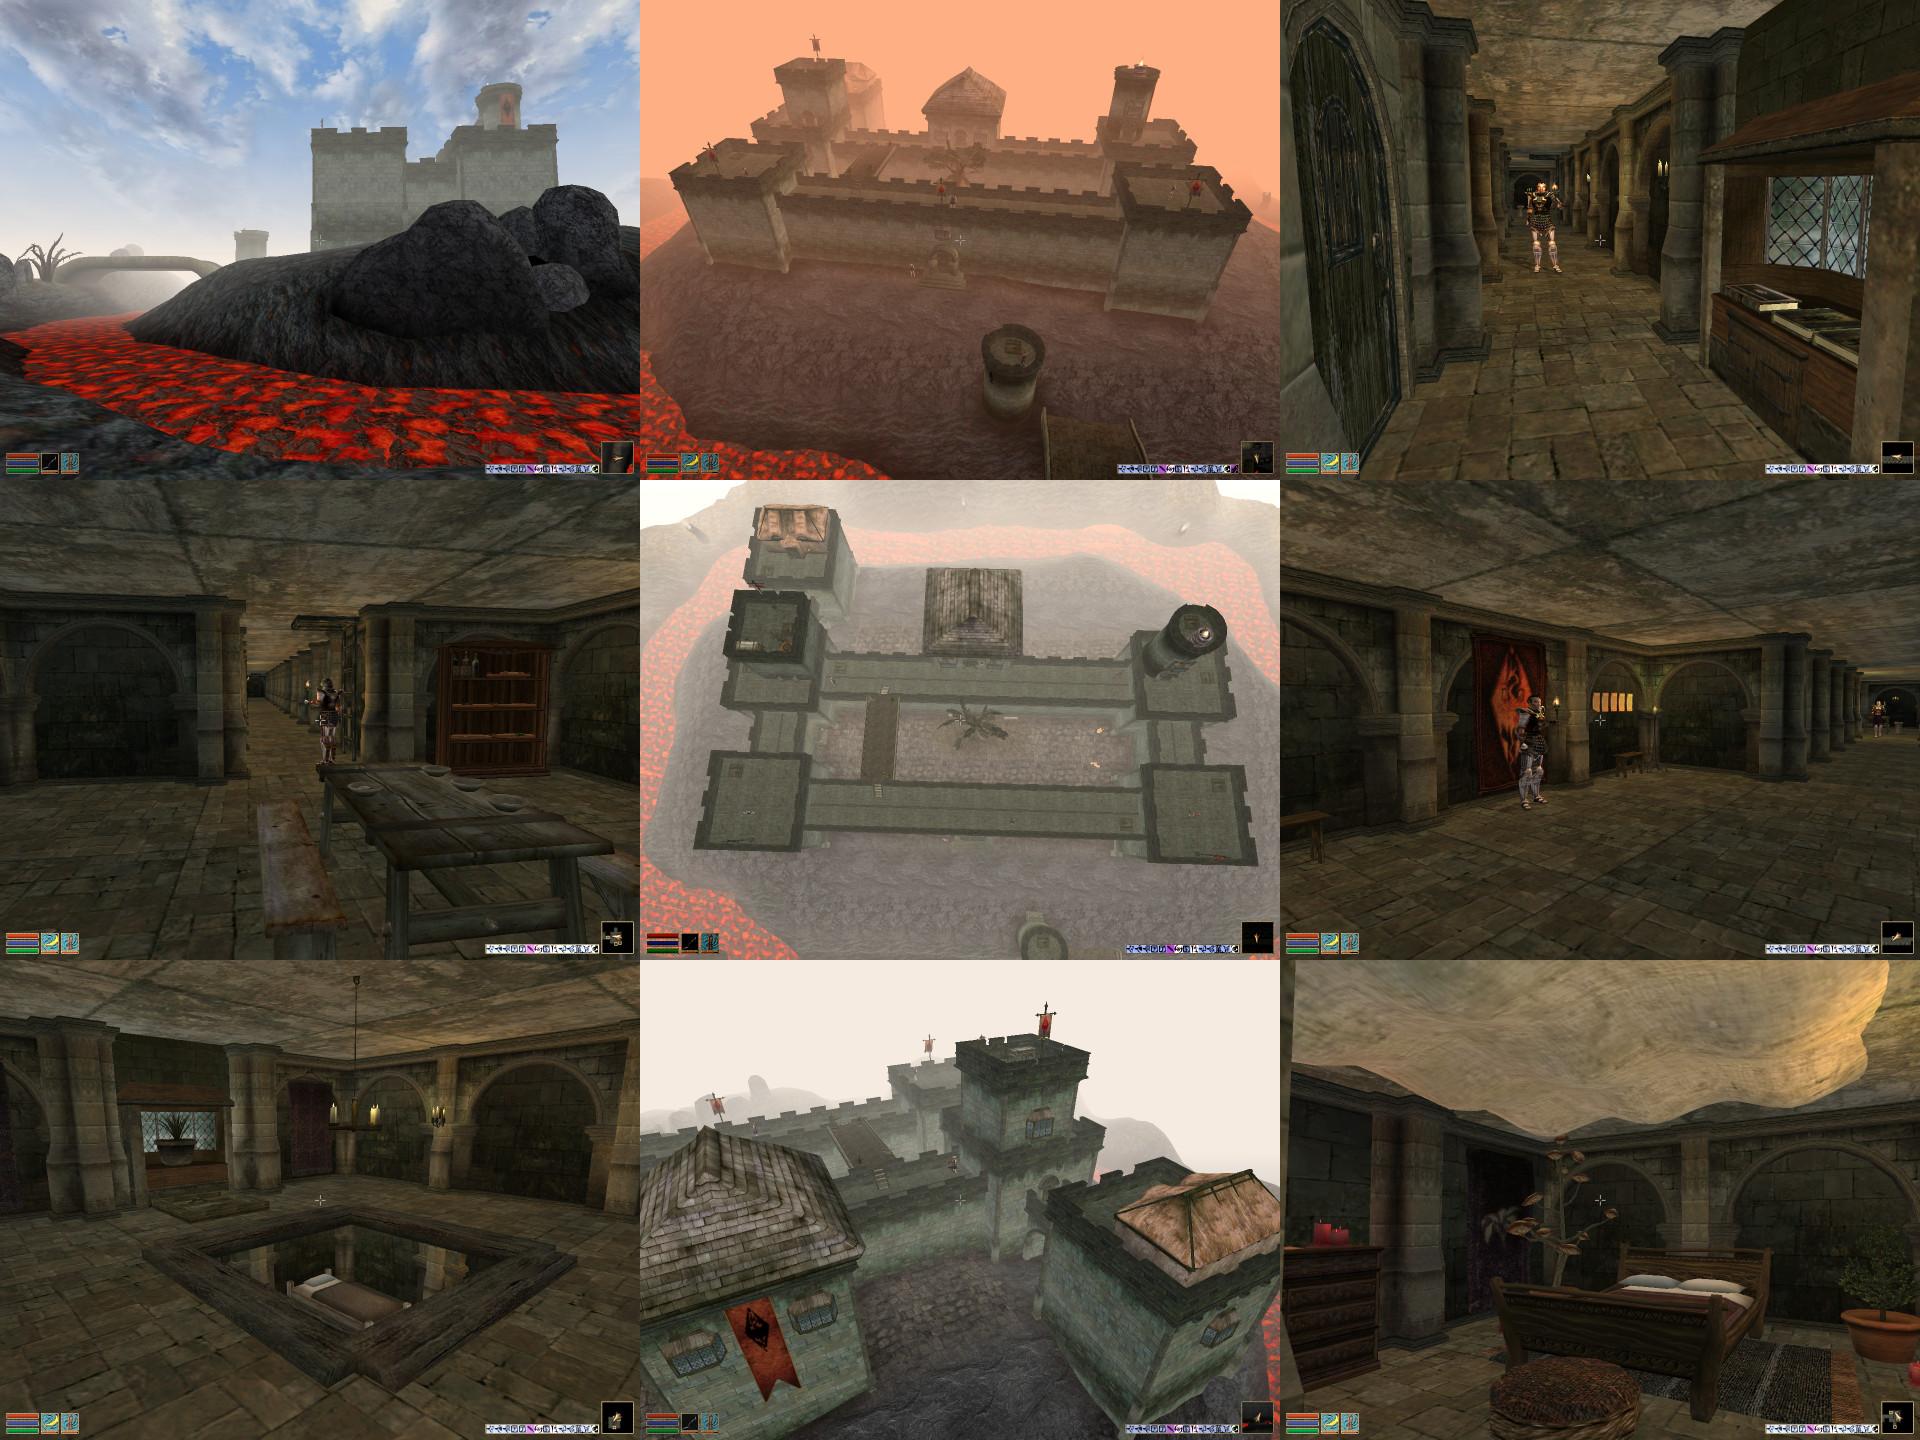 Prison Island (A Morrowind Plug-In)